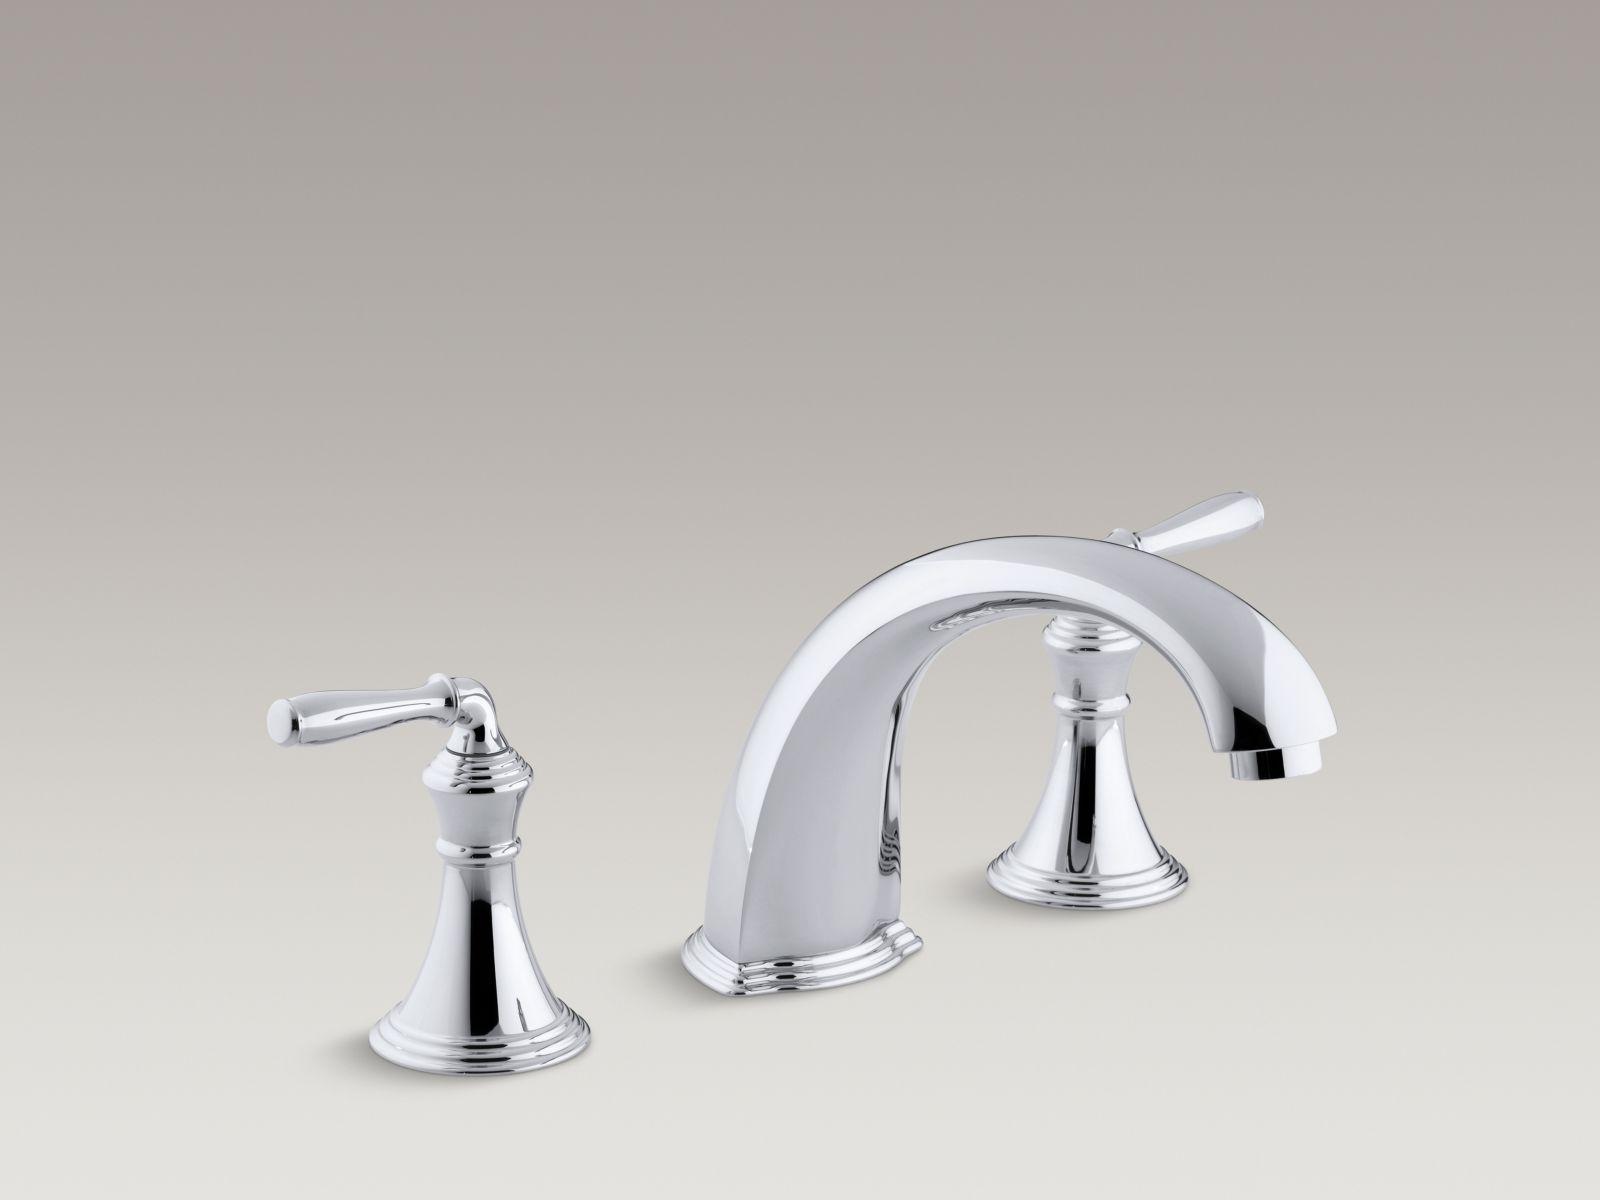 Ideas, kohler stillness tub faucet kohler stillness tub faucet buyplumbing category bathtub filler 1600 x 1200  .